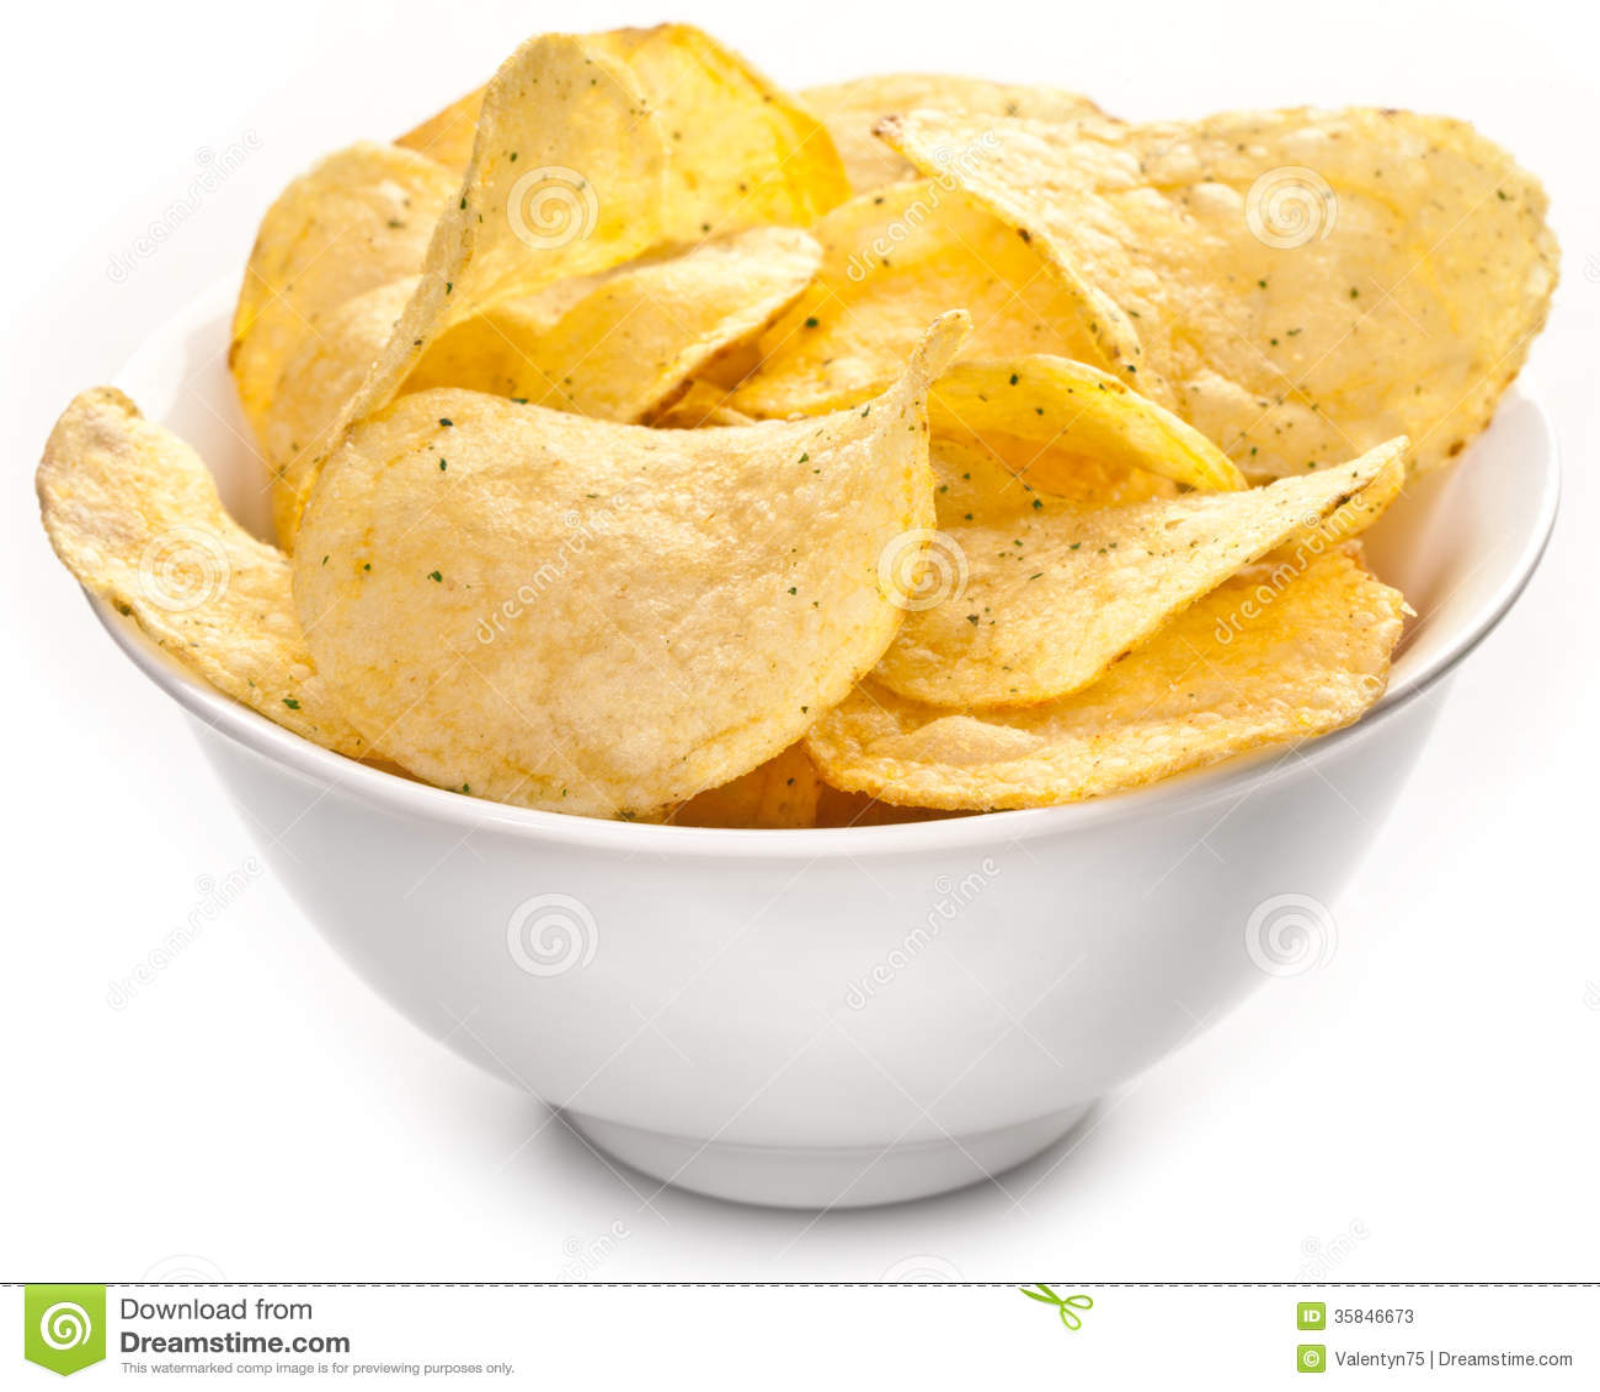 Potato Chips Clip Art Potato chips in a bowl.